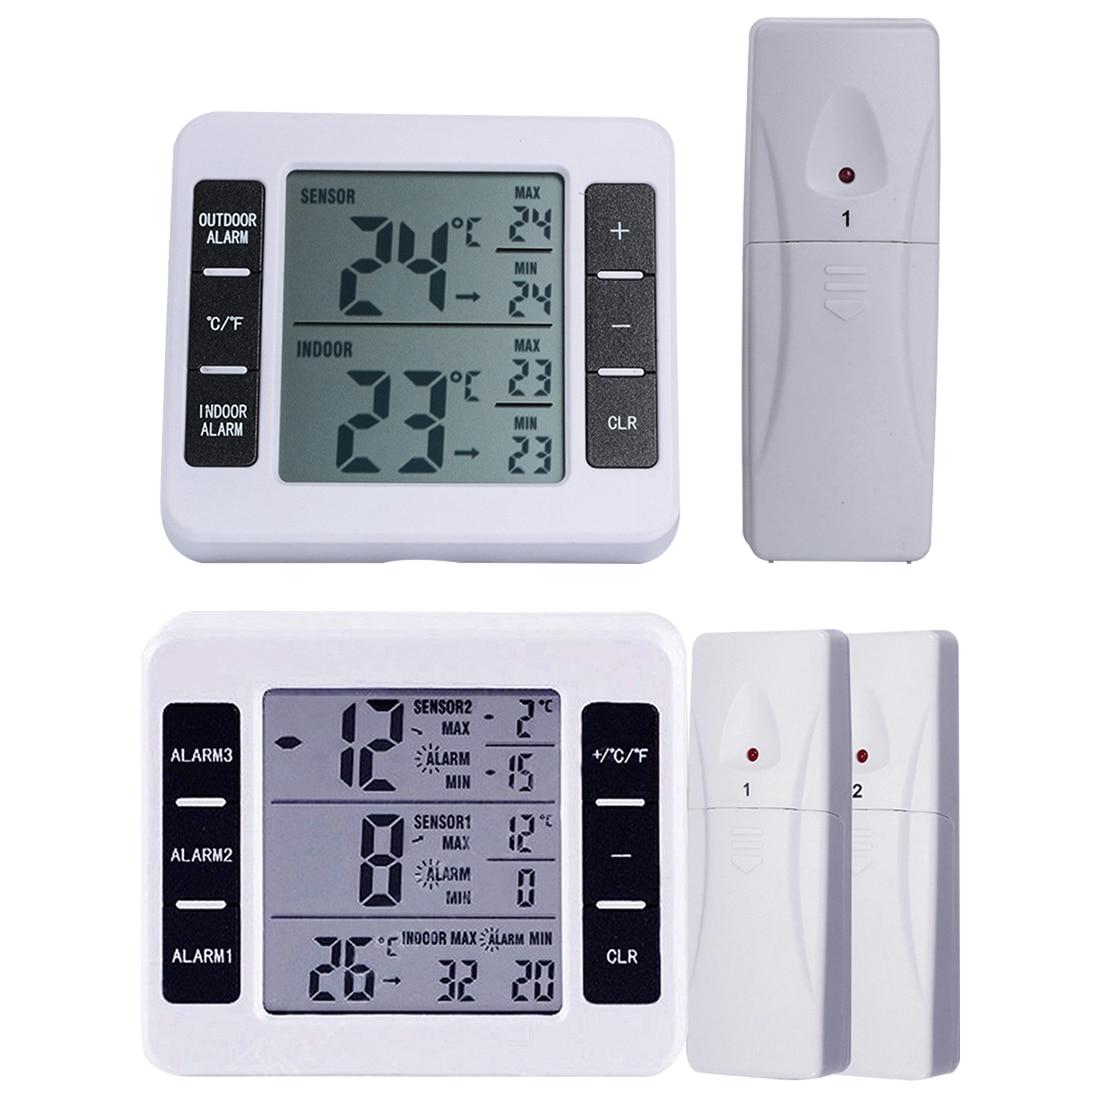 Wireless Digital Audible Alarm Refrigerator Thermometer with 2PCS Sensor Min/Max Display Indoor Outdoor ThermometerWireless Digital Audible Alarm Refrigerator Thermometer with 2PCS Sensor Min/Max Display Indoor Outdoor Thermometer